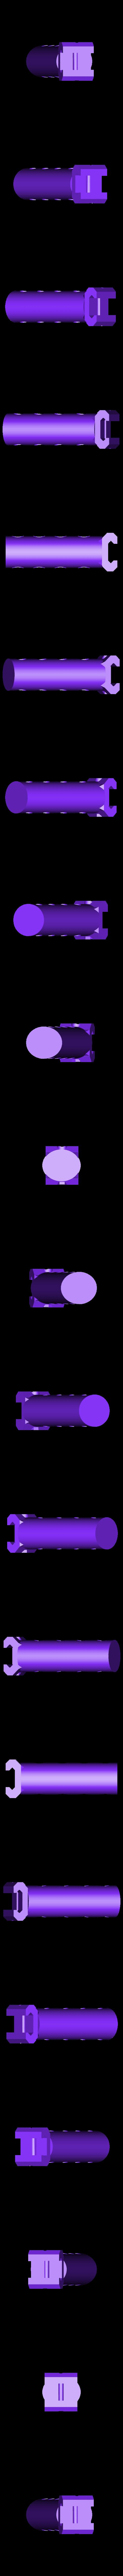 Bodacious_Fyyran_2.stl Download STL file Picatinny Rail Foregrip • Design to 3D print, 3DPrintingGurus